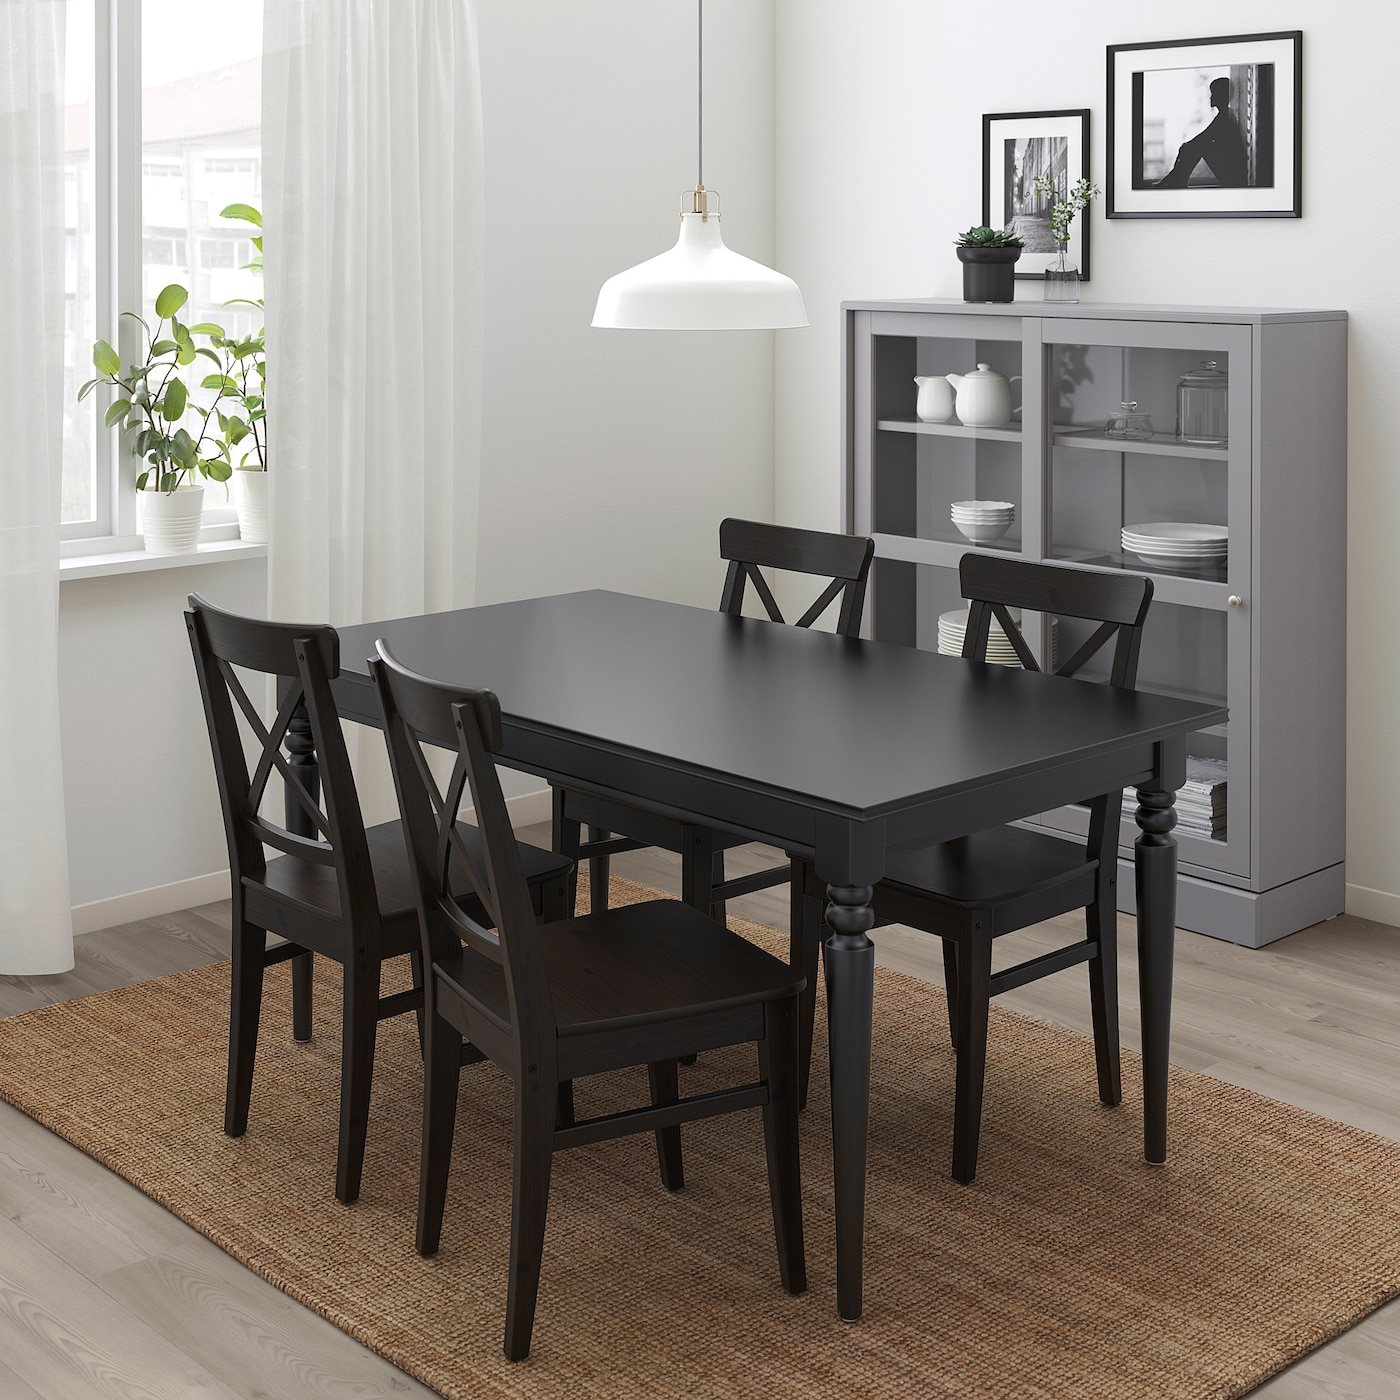 INGATORP / INGOLF Table and 9 chairs   black/brown black   IKEA